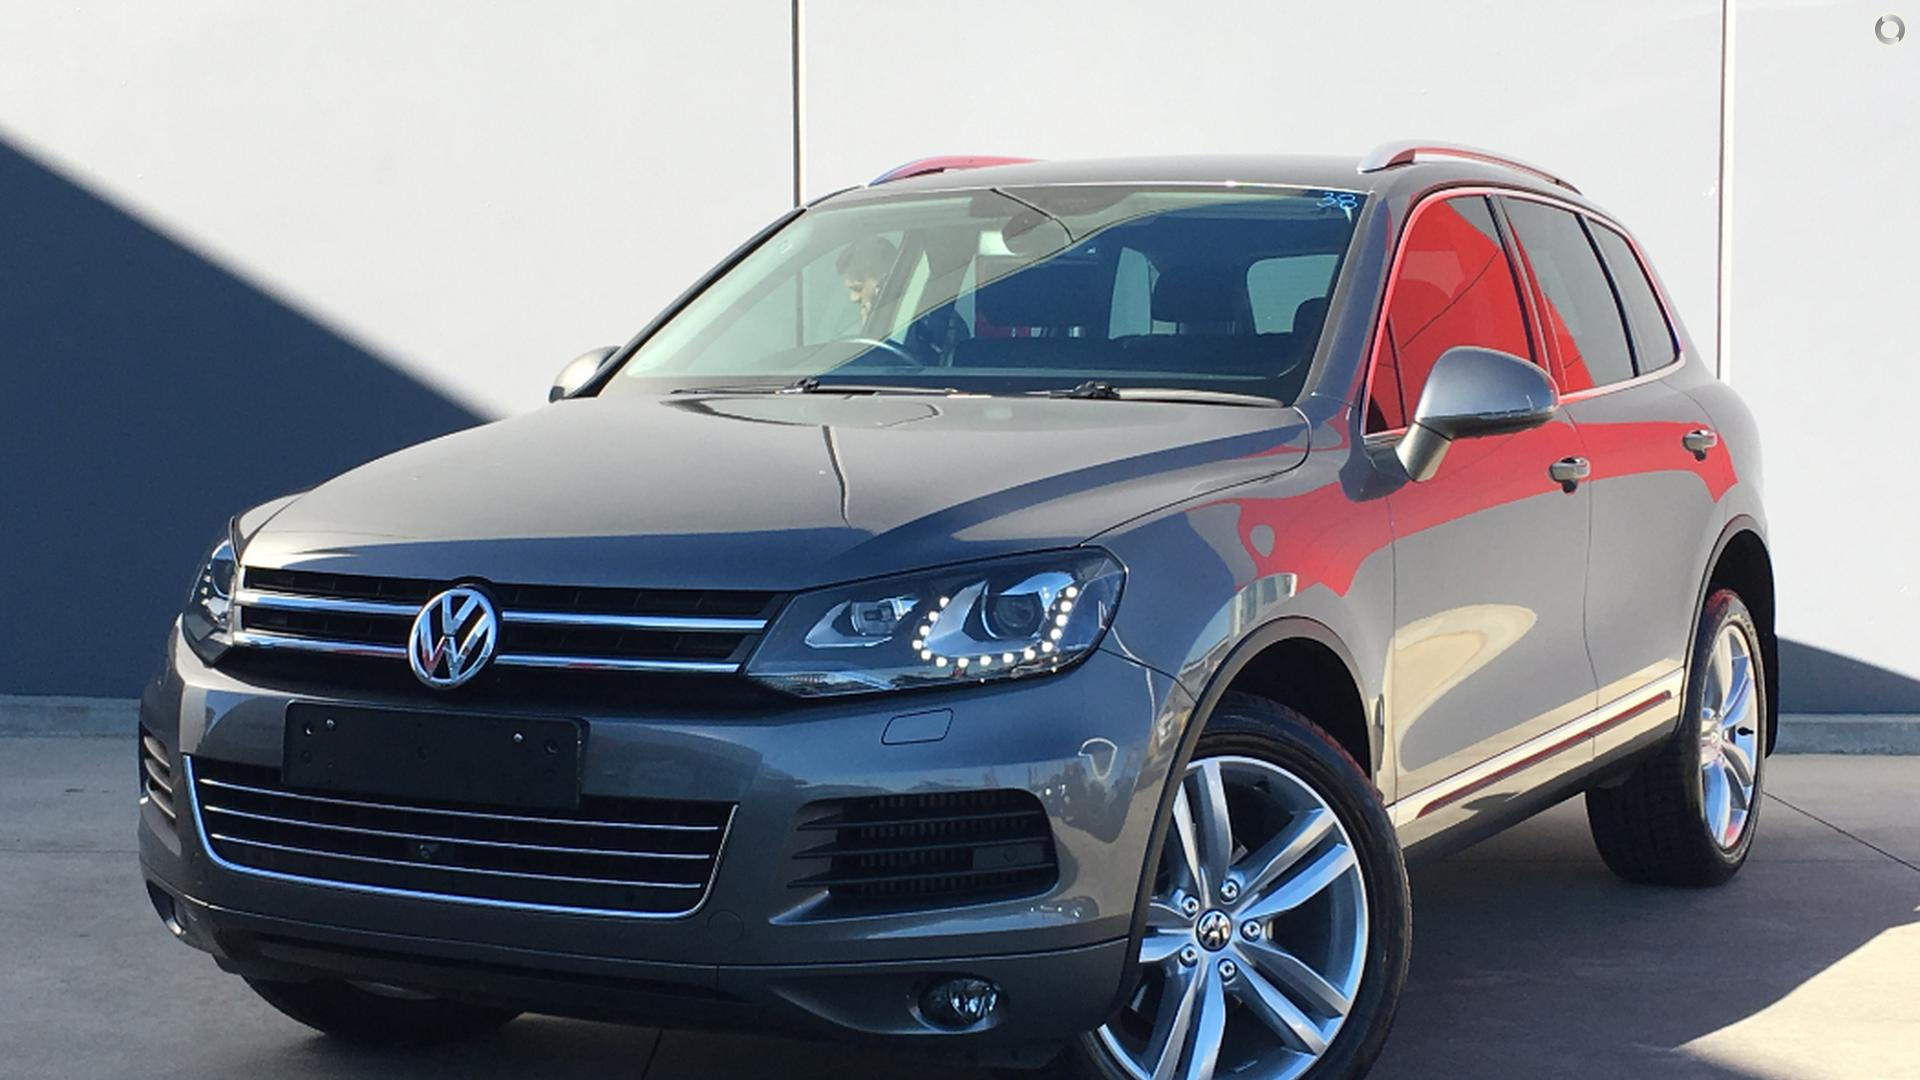 2013 Volkswagen Touareg 7P